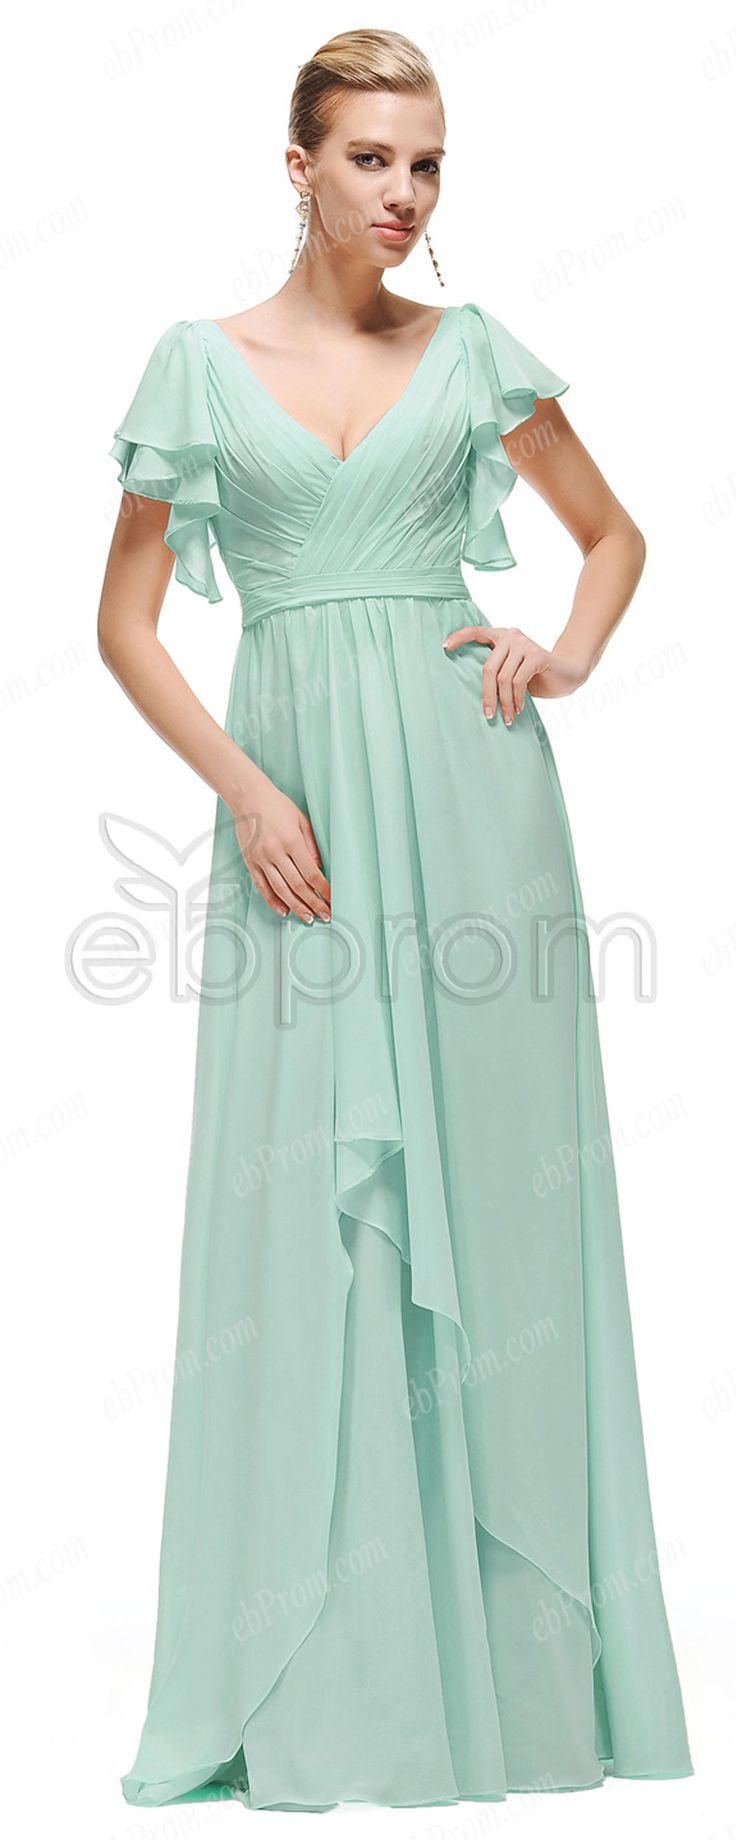 53 best pink dress images on Pinterest | Feminine fashion, My style ...